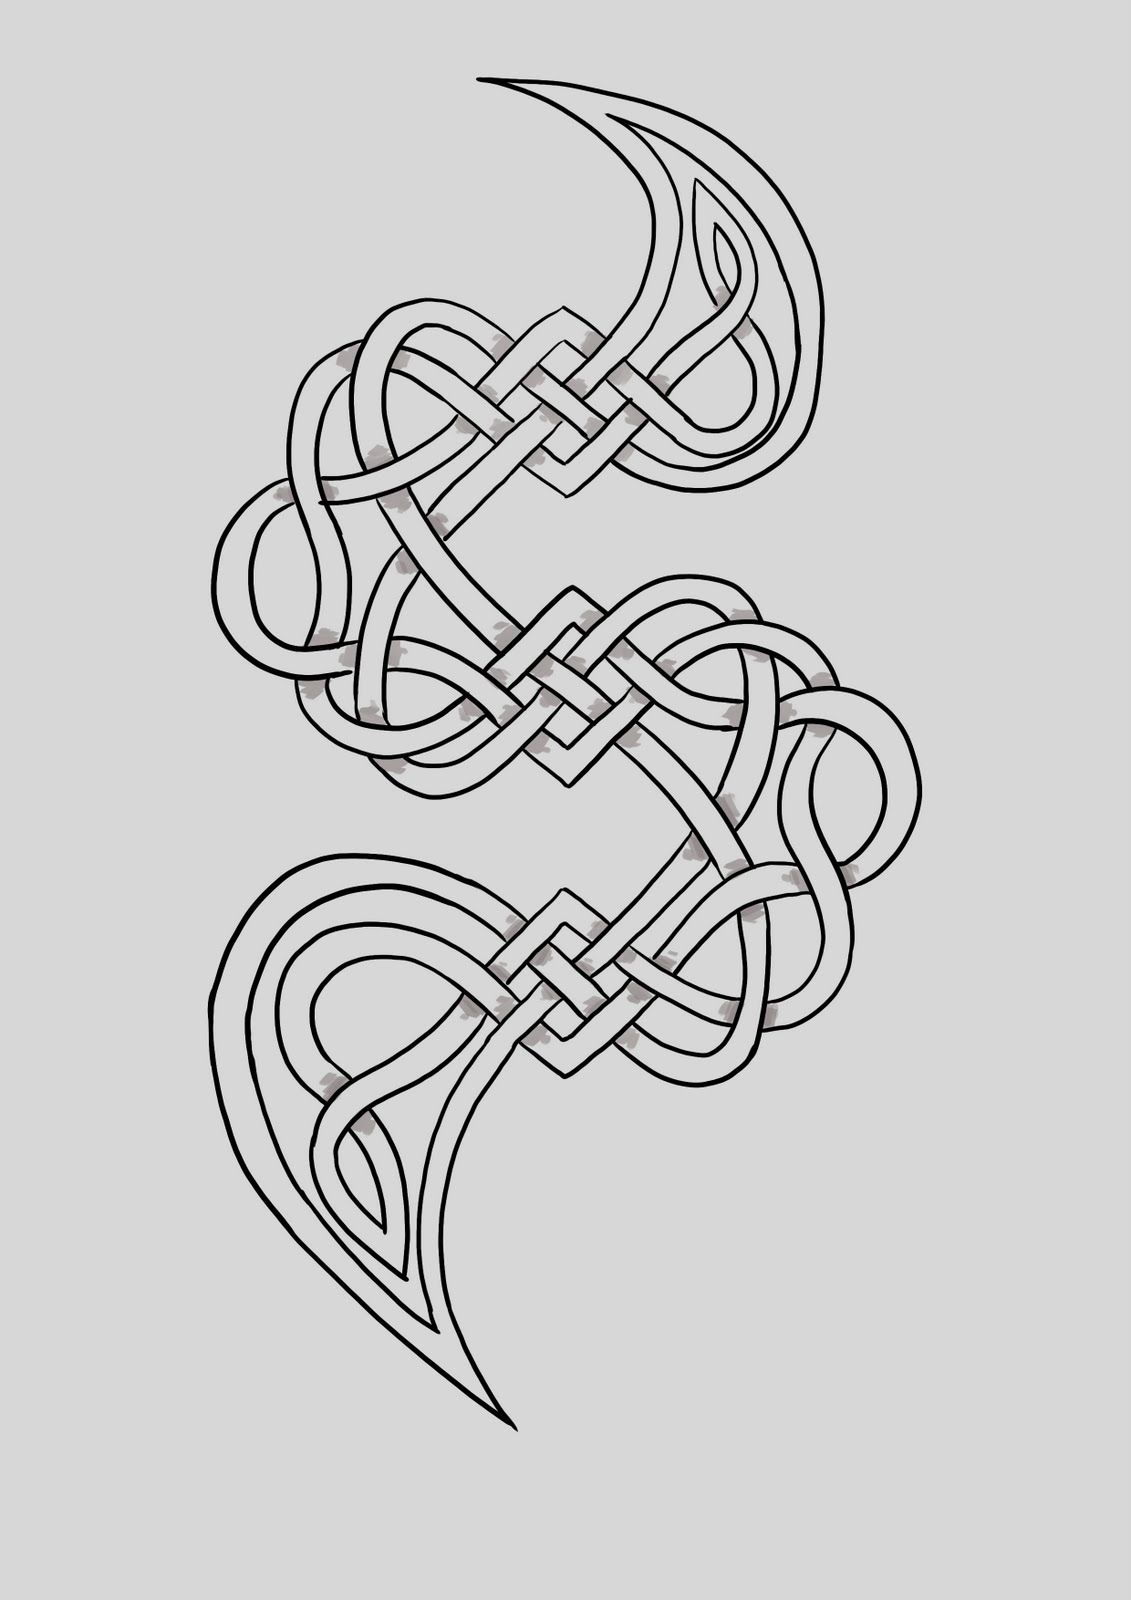 Nudo celta | Botas | Pinterest | Nudos celtas, Celta y Nudo